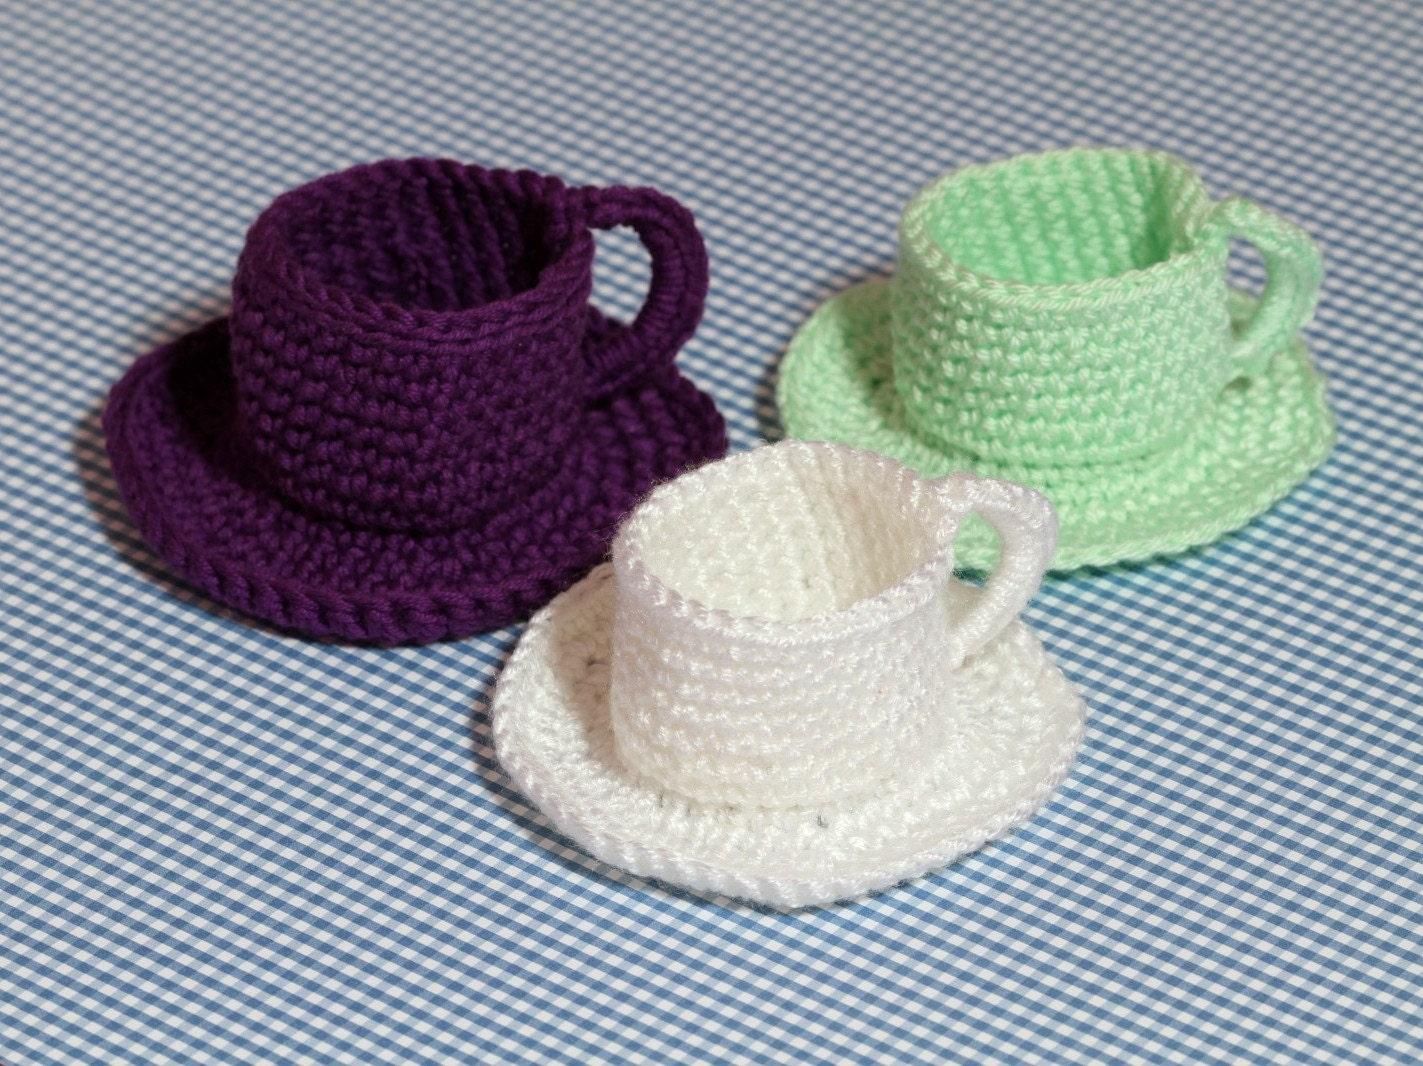 Tea Cup and Saucer Crochet Pattern, PDF Crochet Pattern, Tea Cup ...